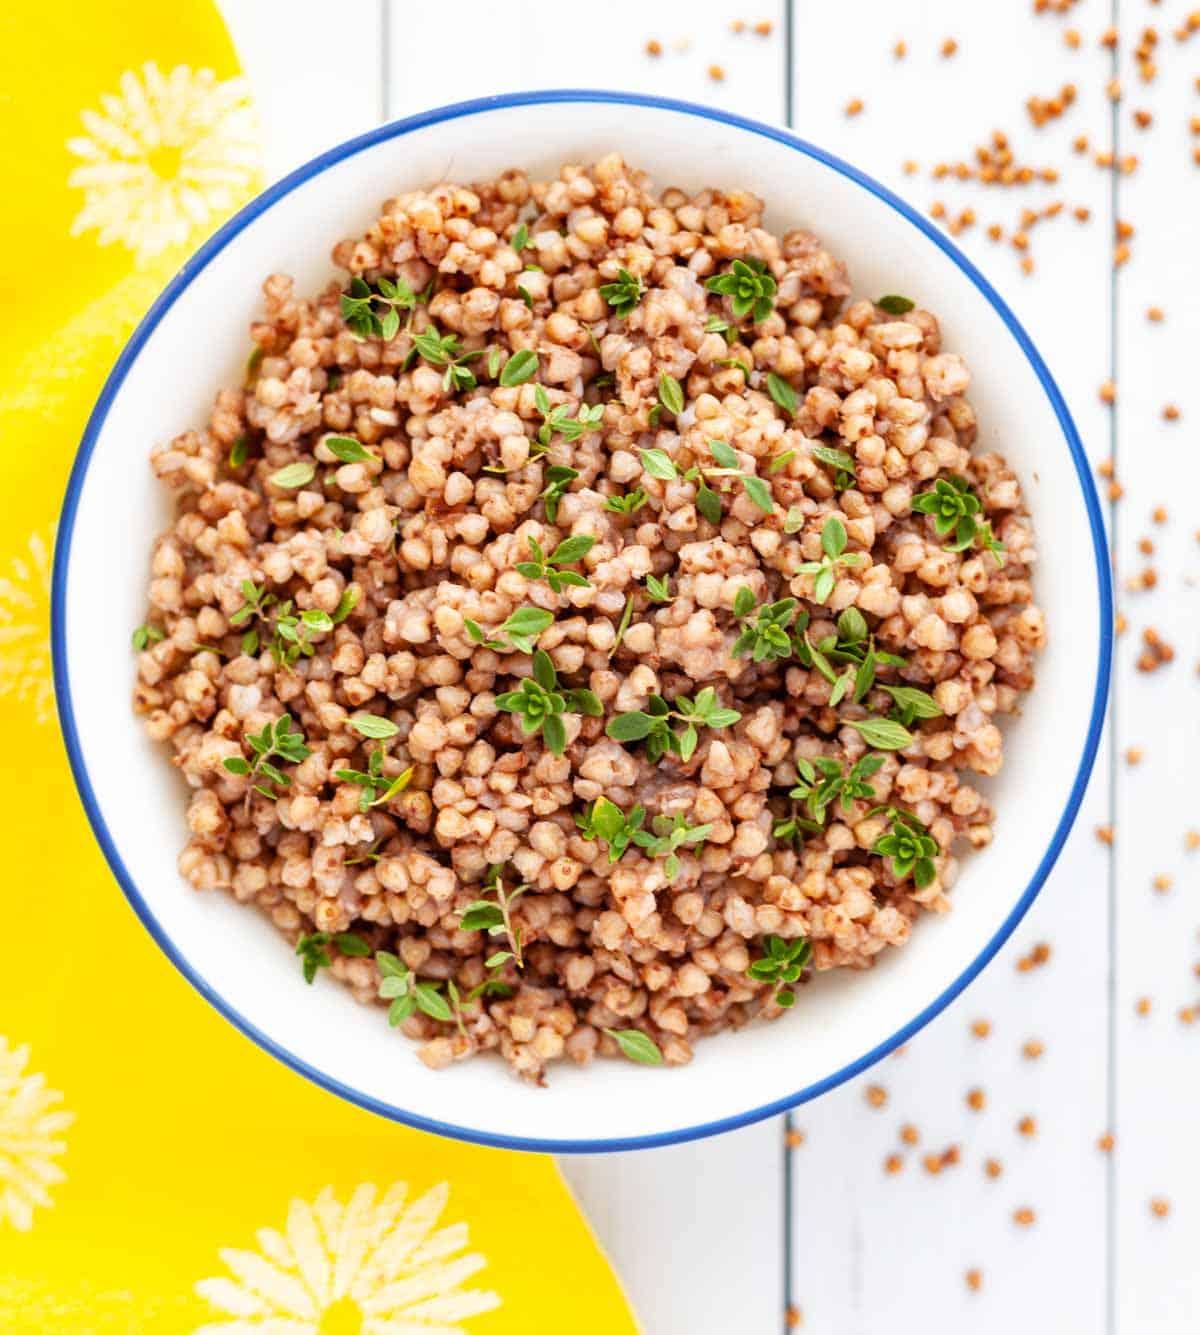 bowl of Instant Pot buckwheat